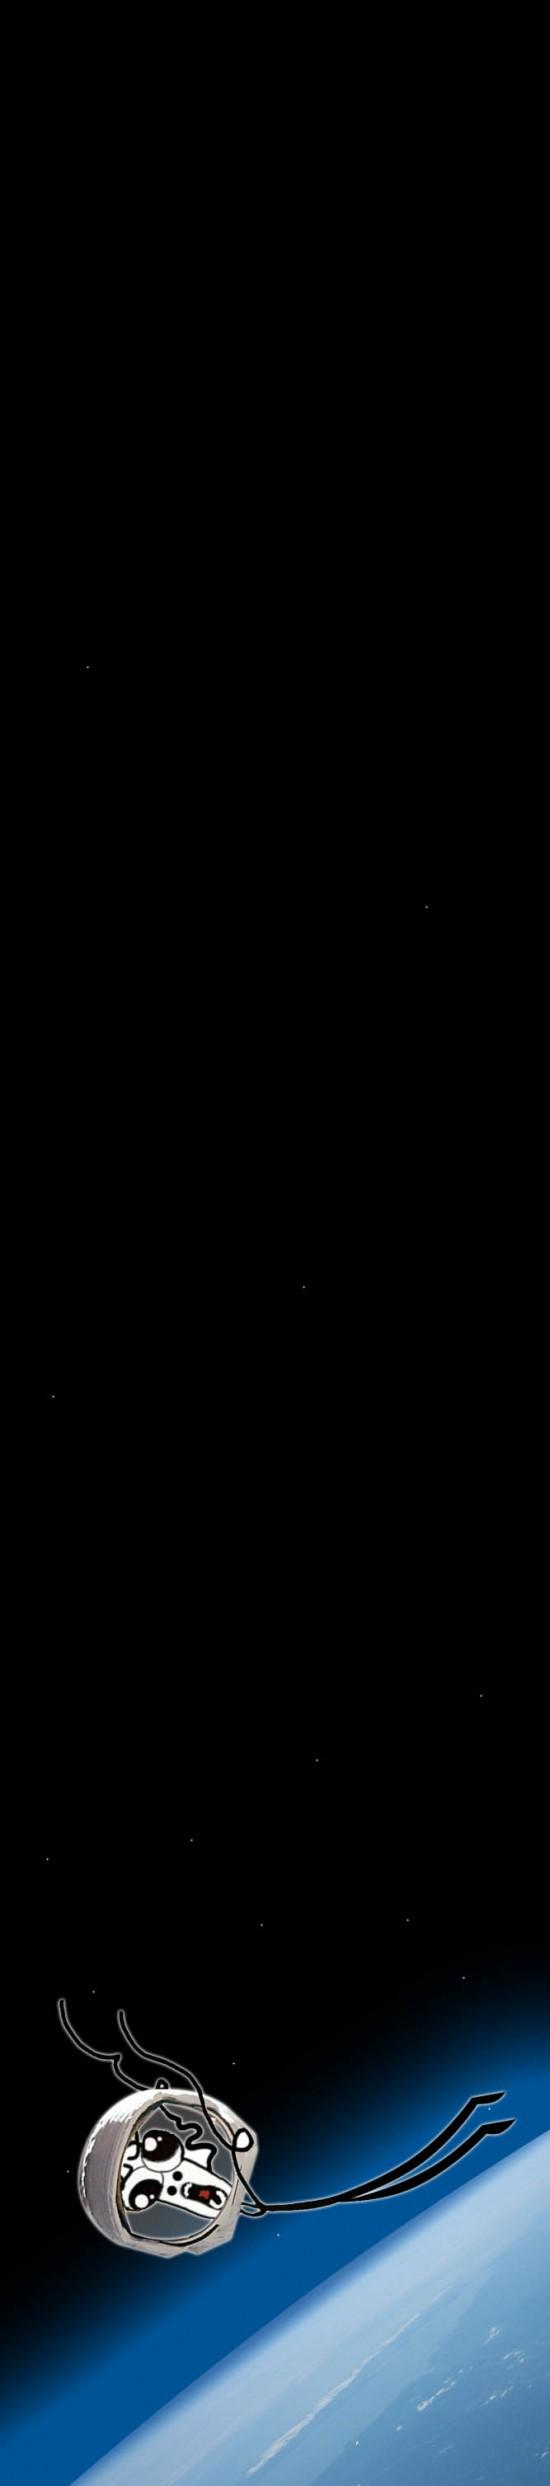 espacio,felix baumgartner,red bull,salto,stratosphere